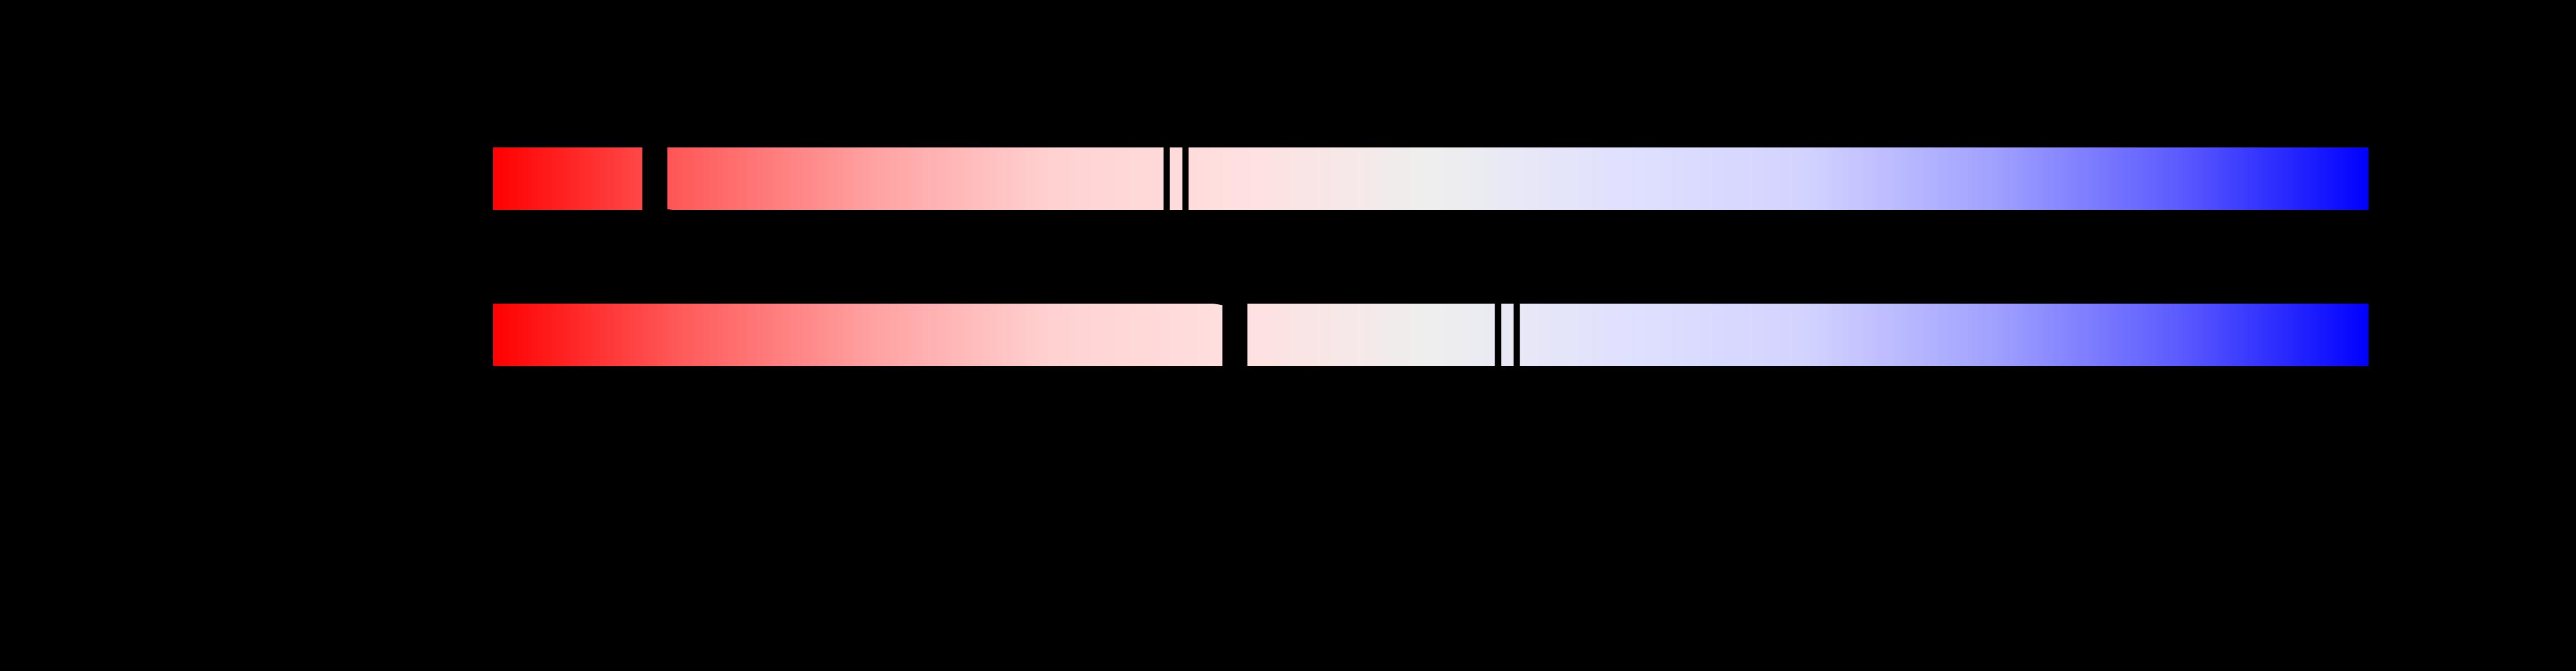 1jgo_multipercentile_validation rcsb pdb 1jgo the path of messenger rna through the ribosome